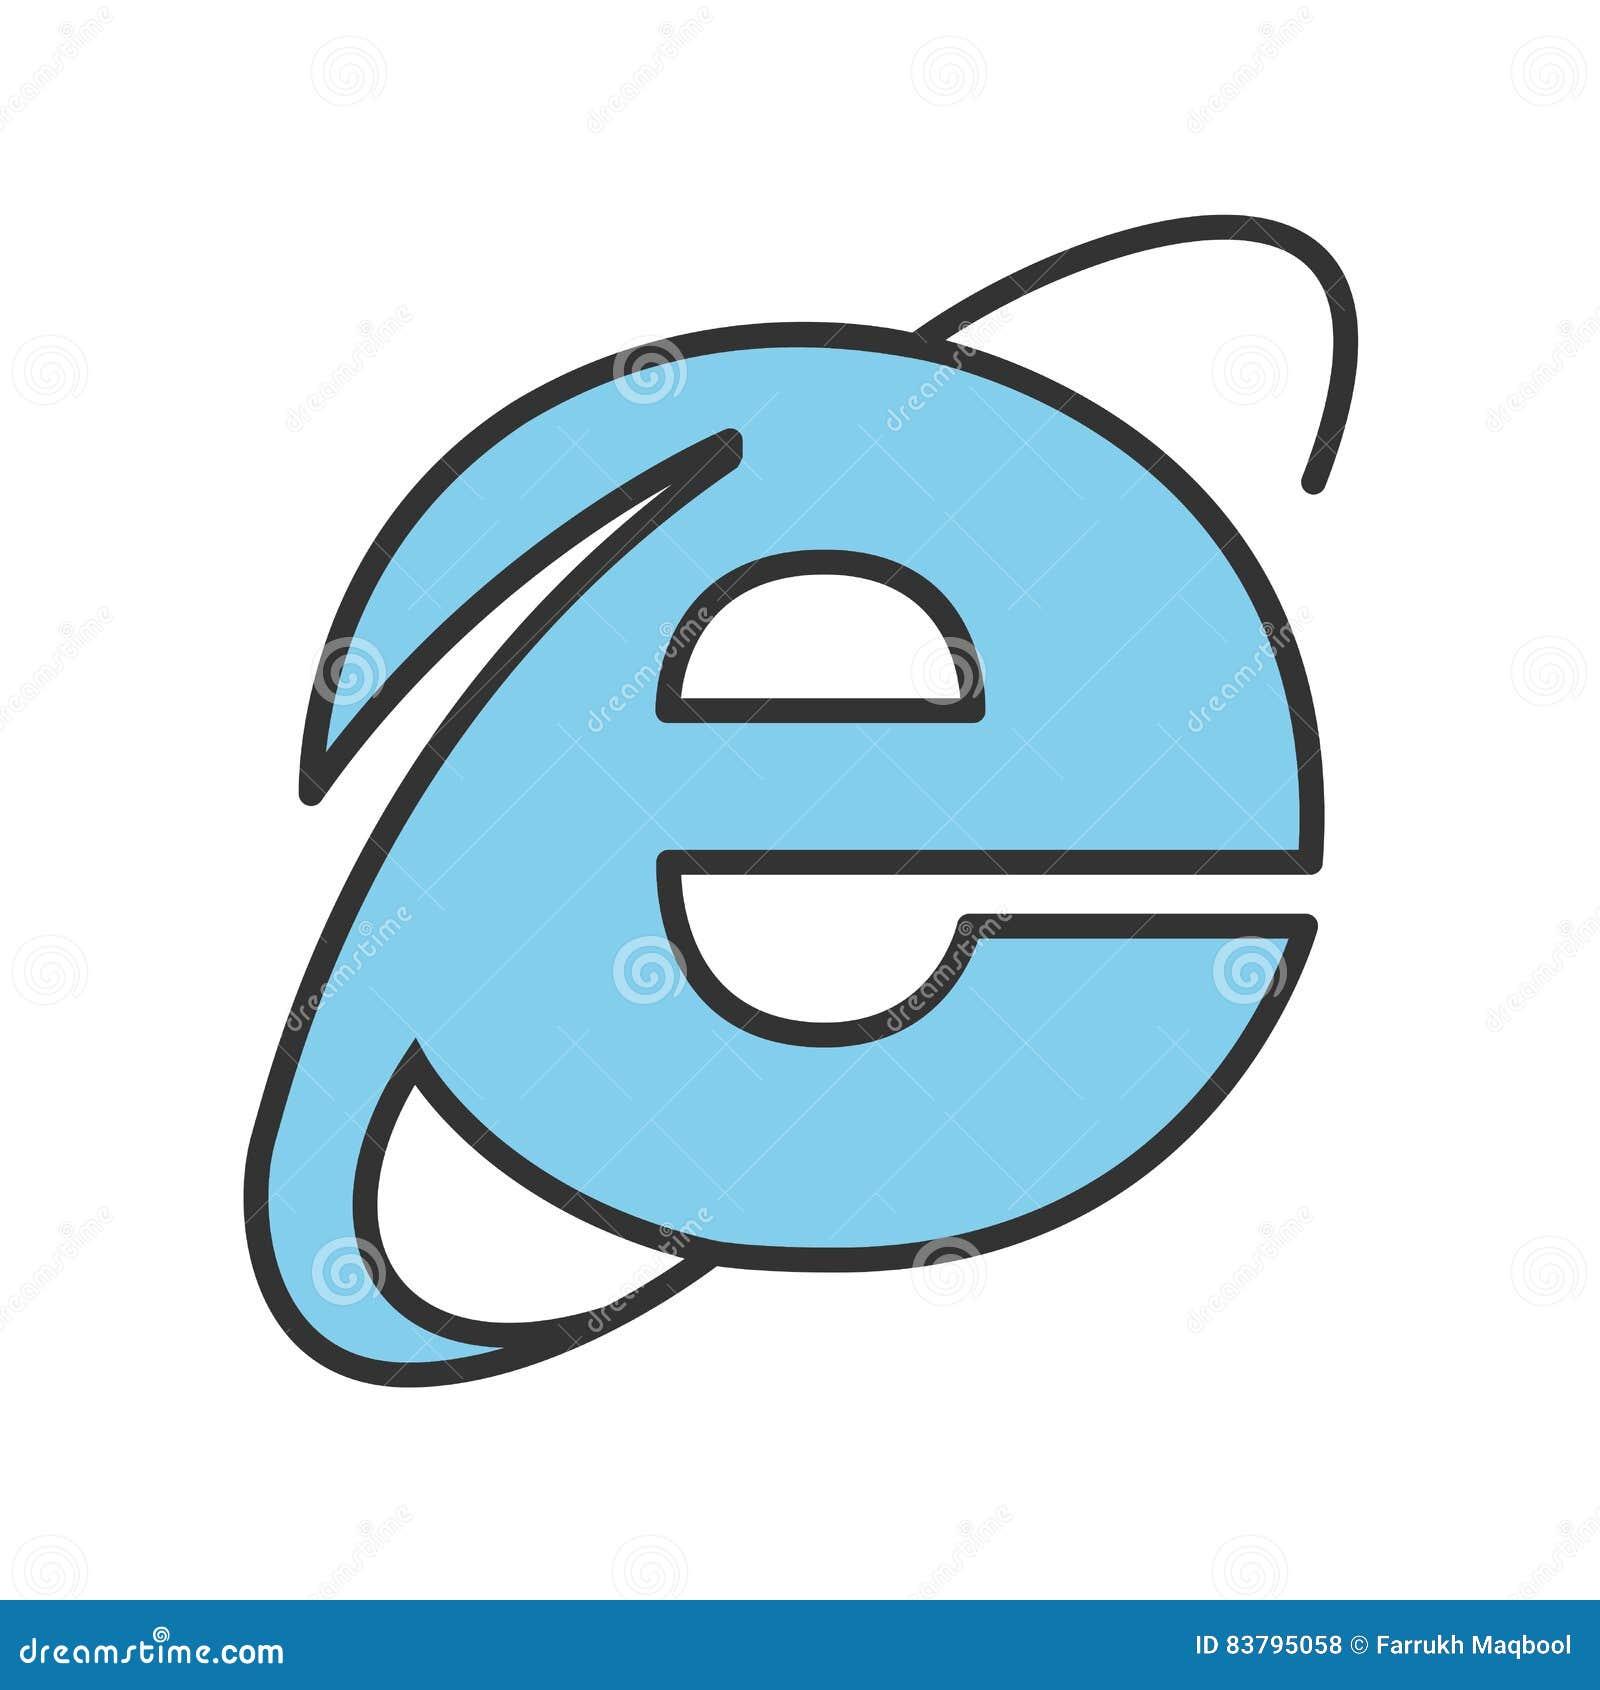 Internet Explorer Editorial Stock Photo Illustration Of Internet 83795058